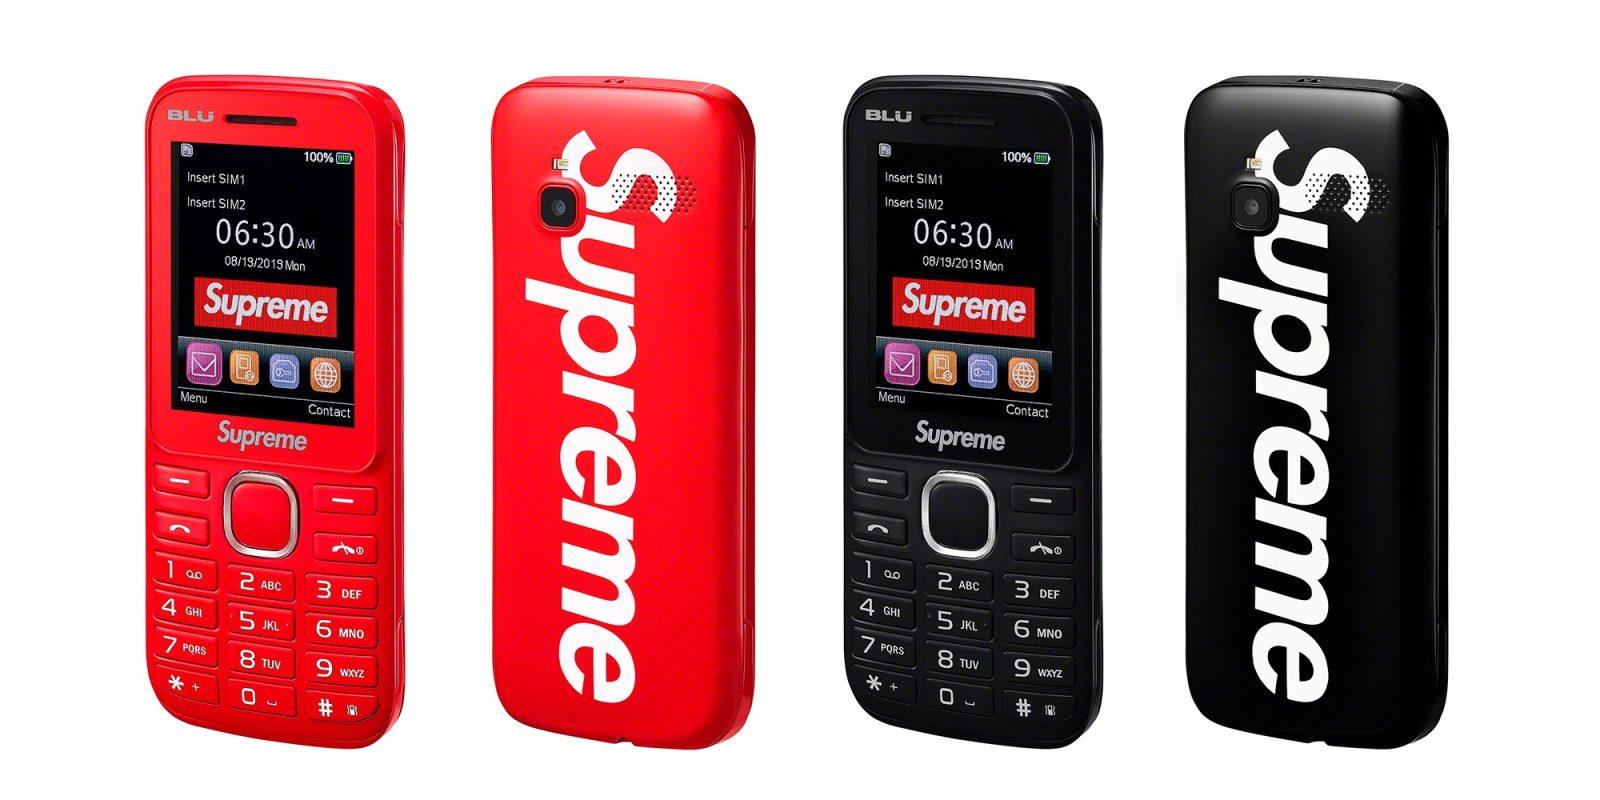 Supreme's fall catalog lets streetwear fans buy a branded burner phone, more